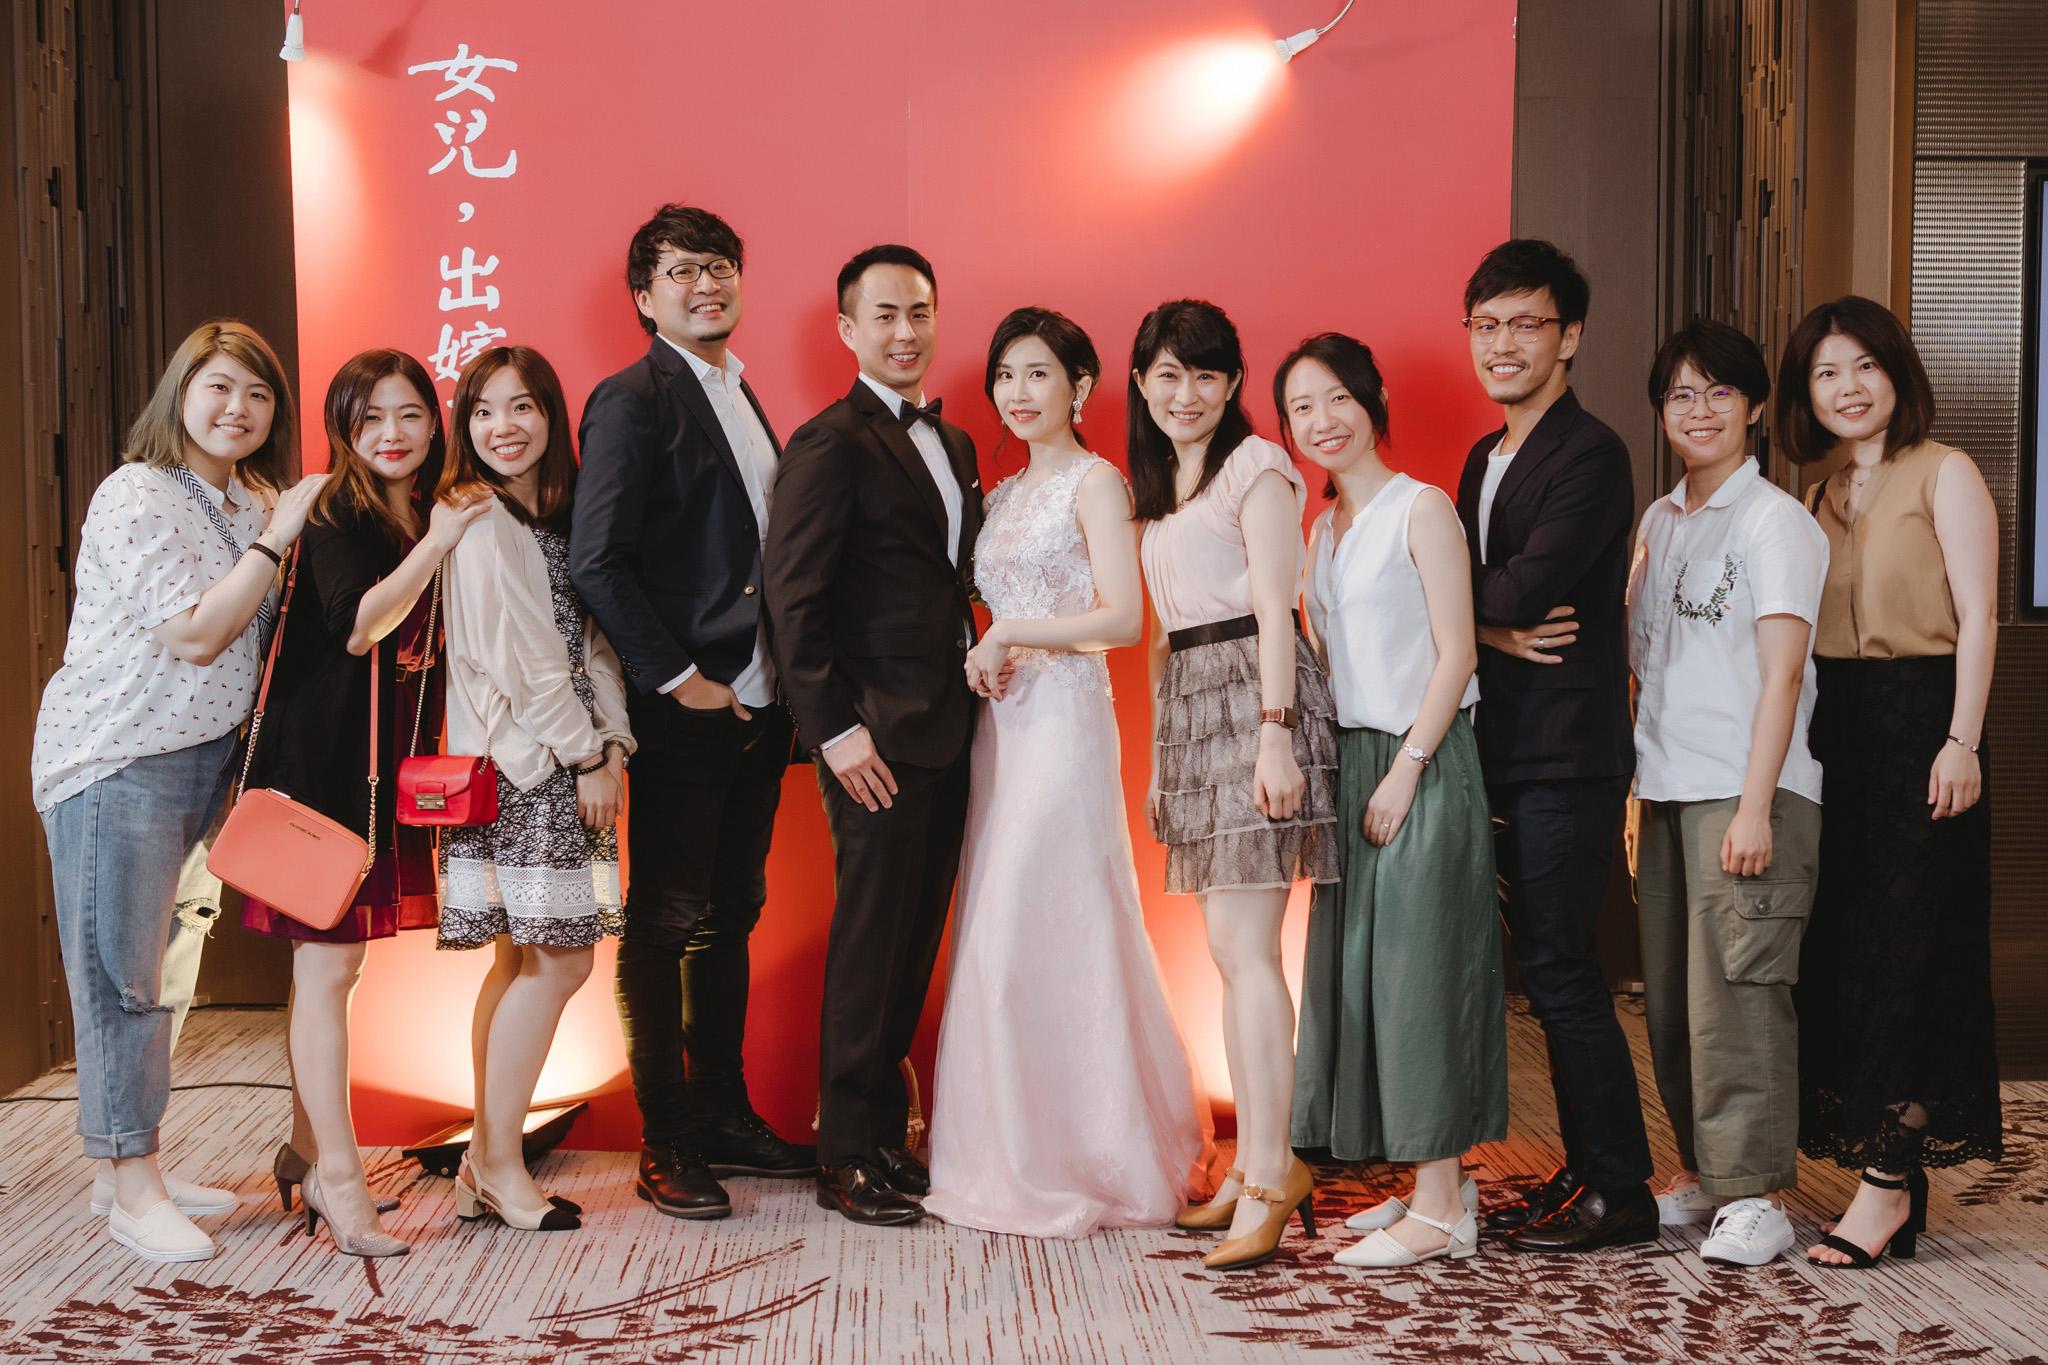 EW 居米 台北禮服 台北婚紗 台北婚攝 國泰萬怡 台北婚禮-43